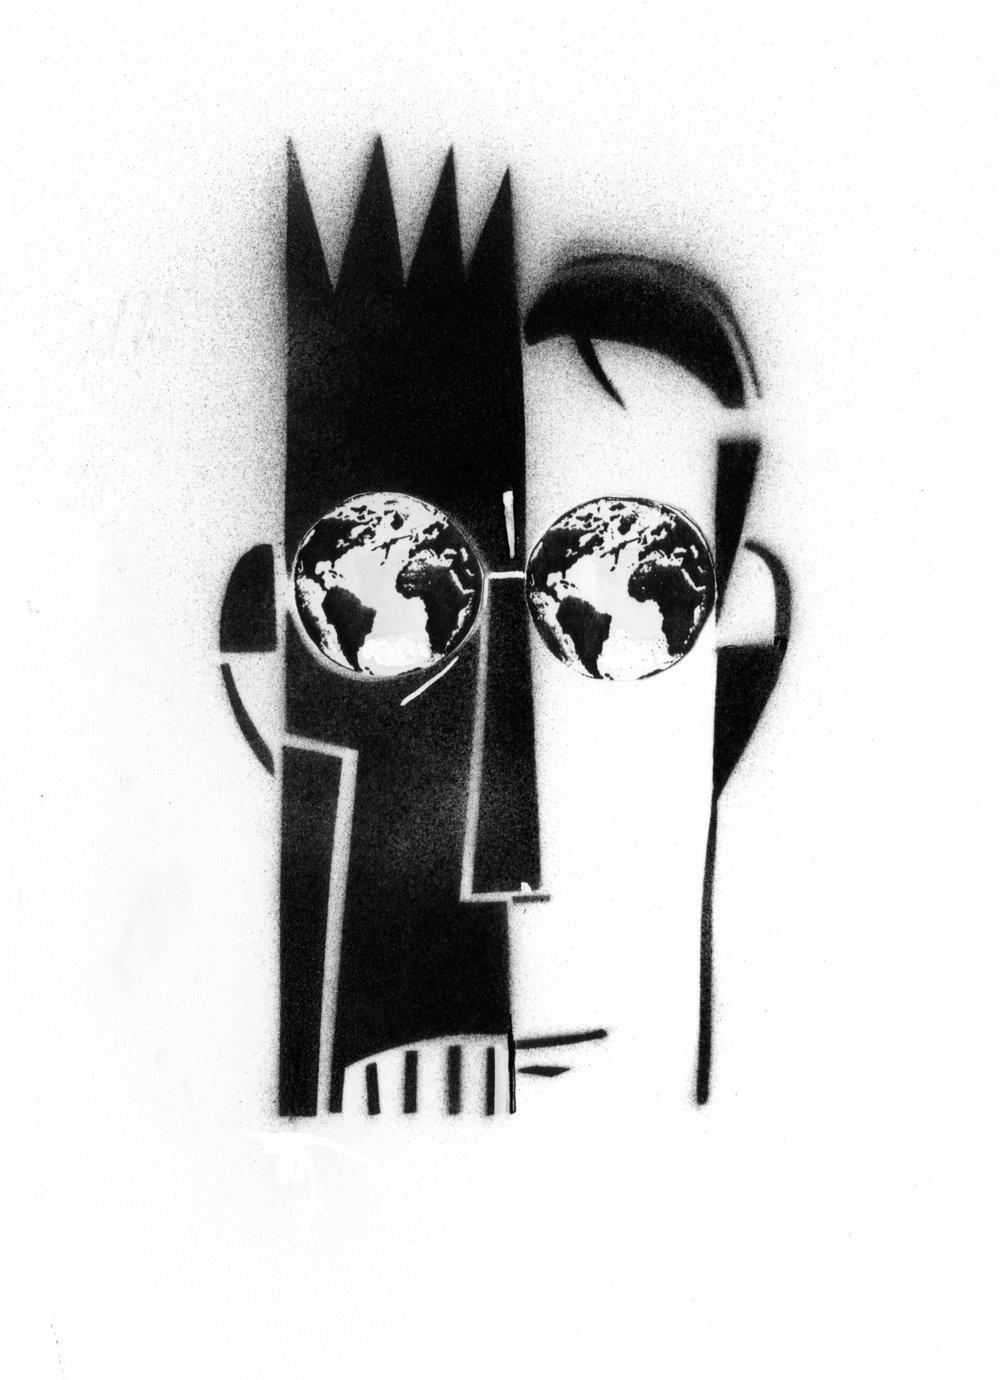 world_glass001